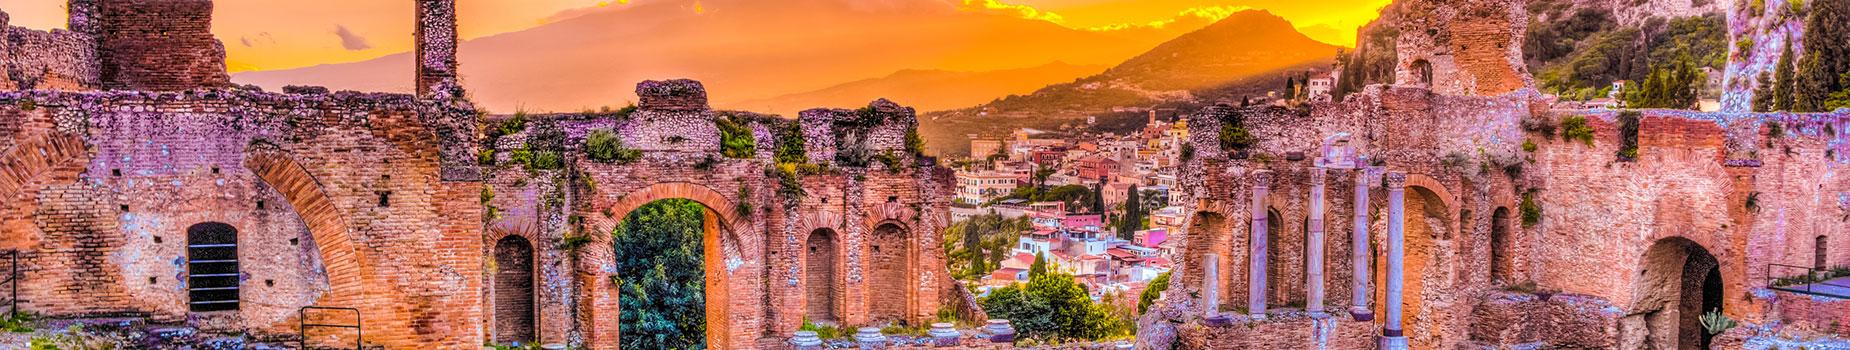 Vlieg busreis Sicilië